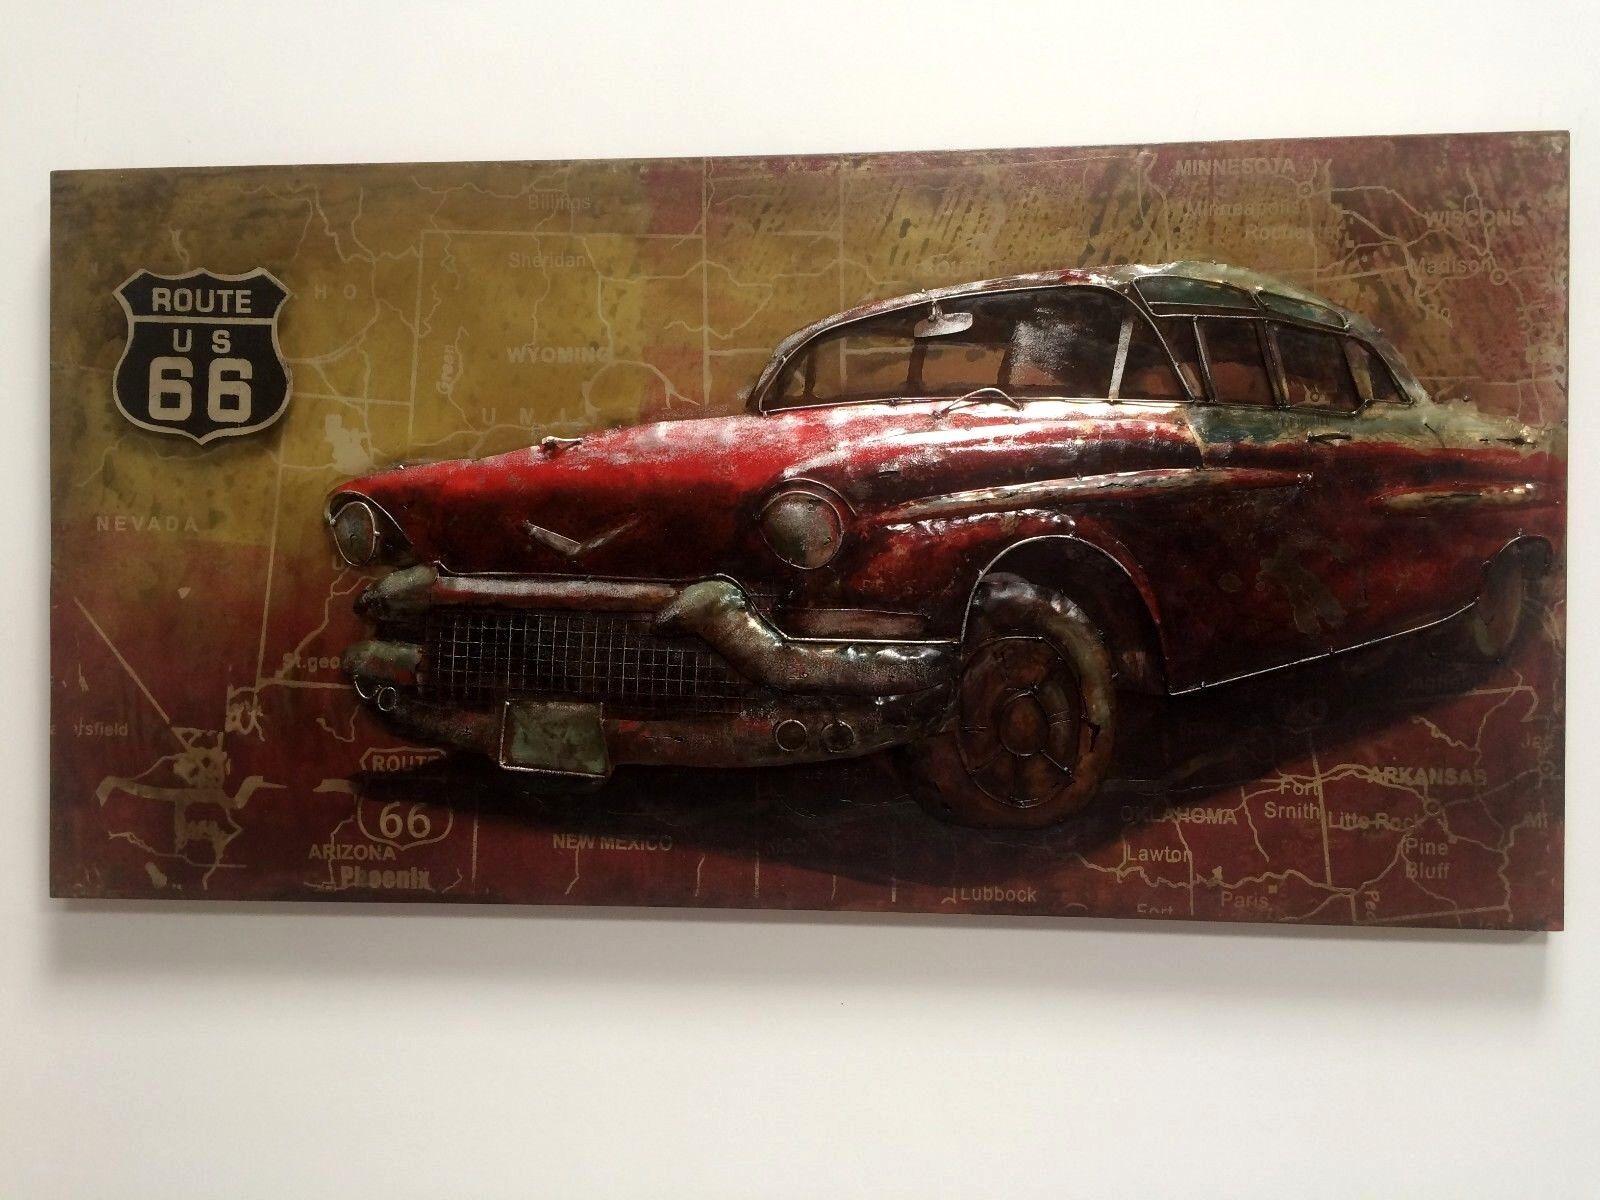 Metallbild Oldtimer Freiheit Kult vintage 3D Loft Art Deko Wandbild Einzug Loft